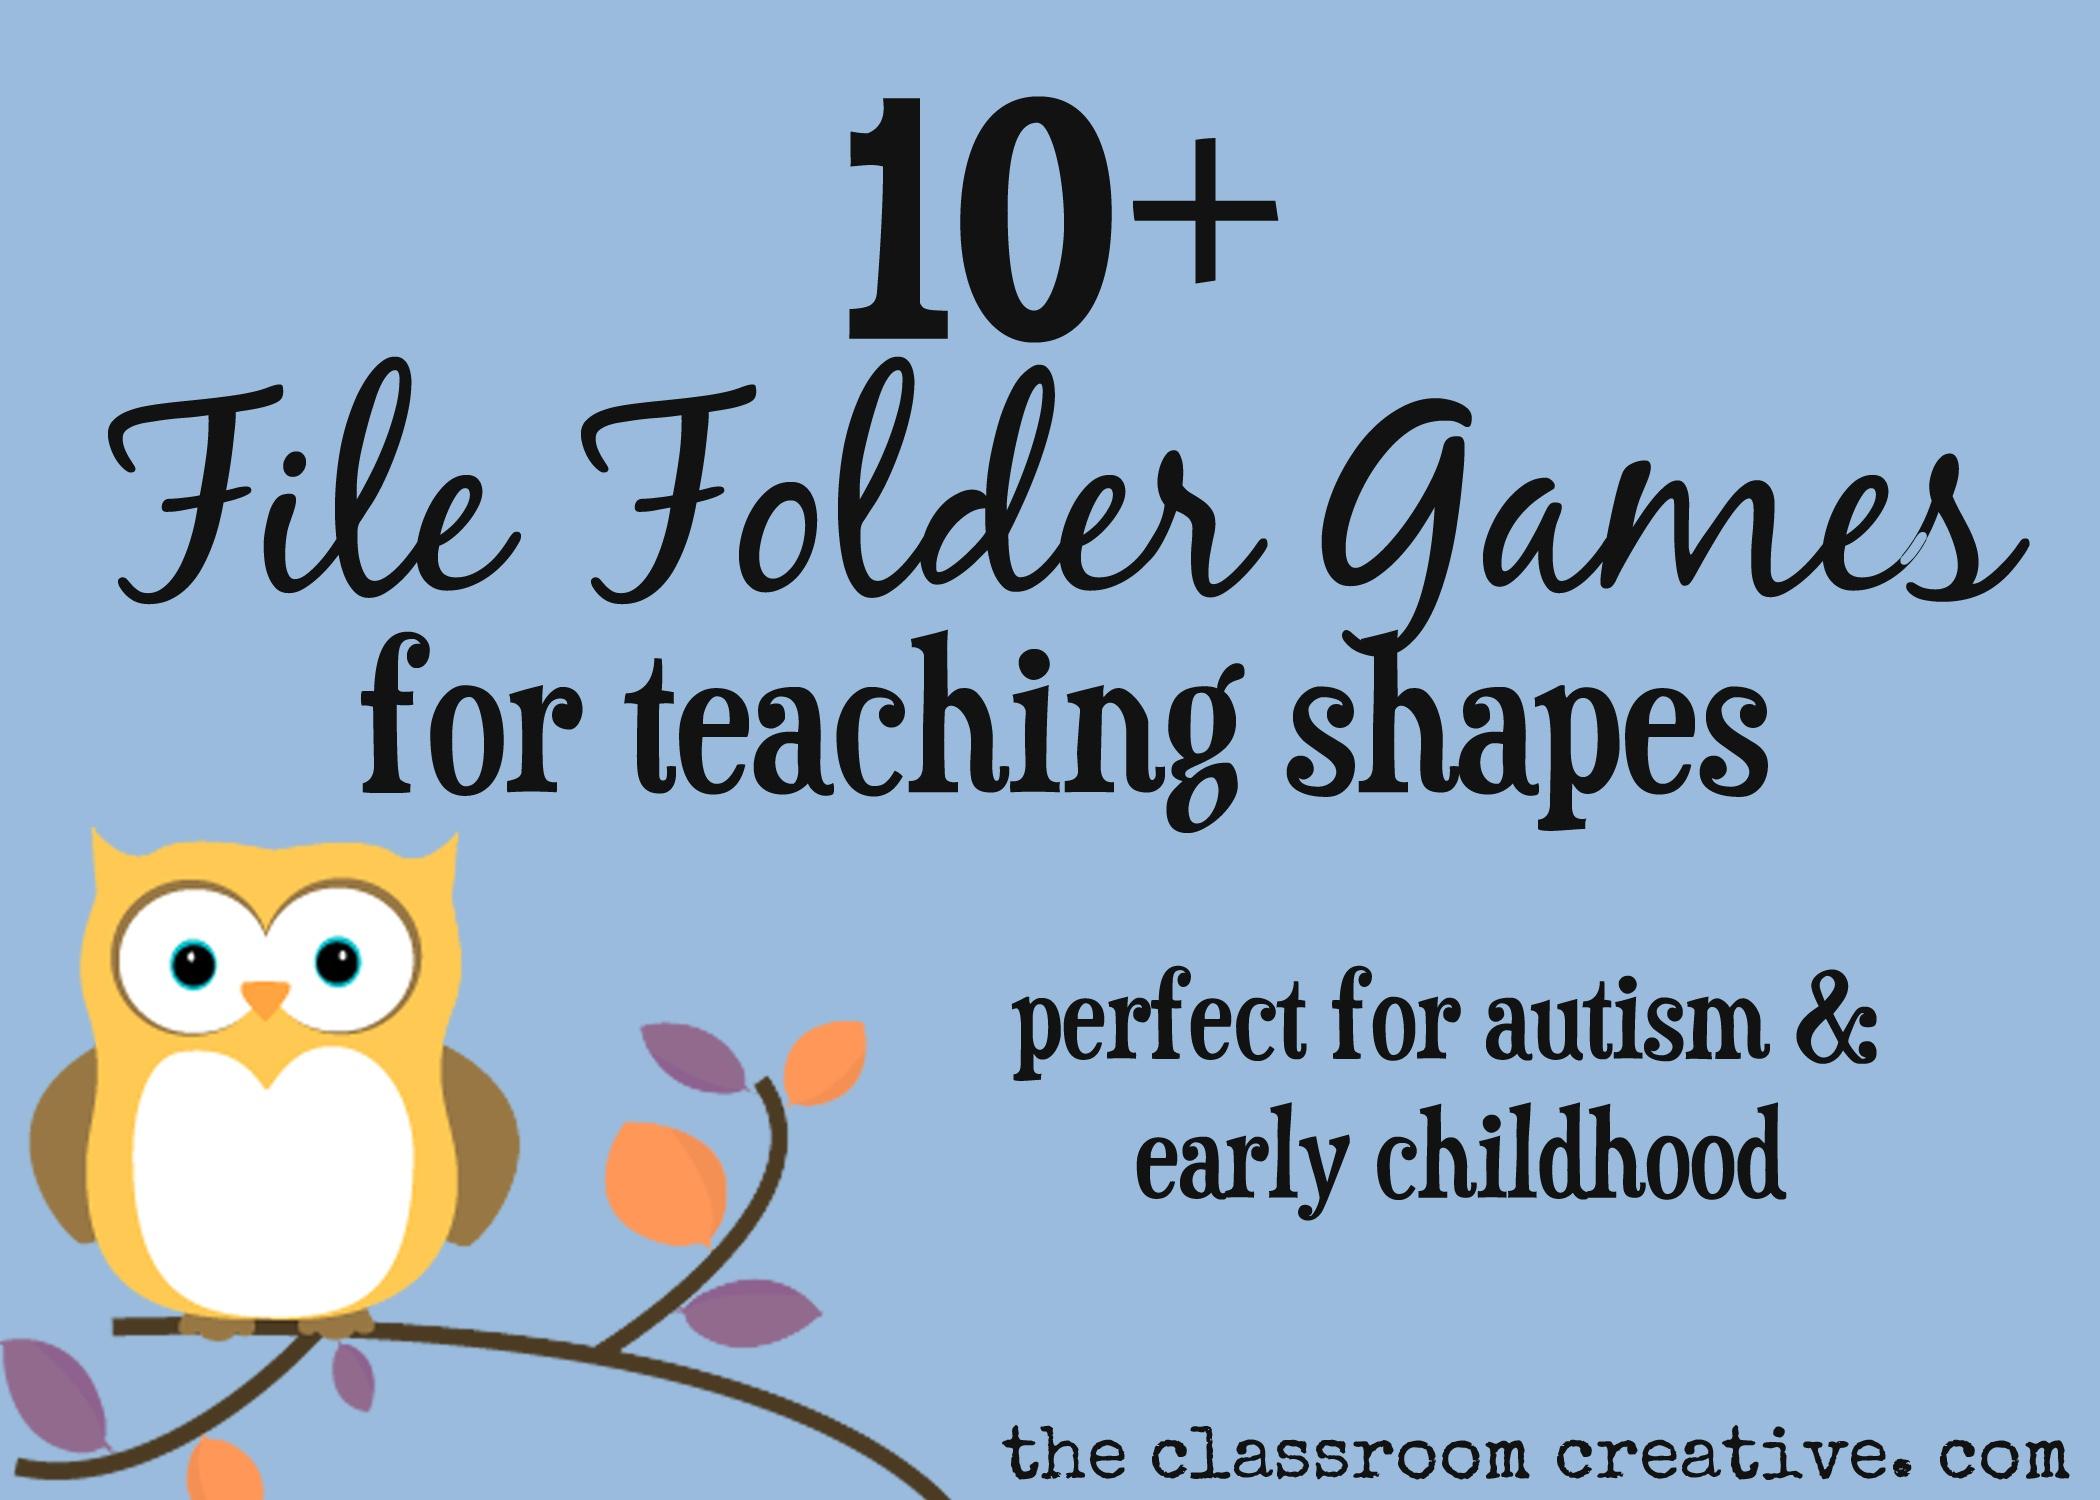 File Folder Games For Teaching Shapes - Free Printable File Folder Games For Preschool